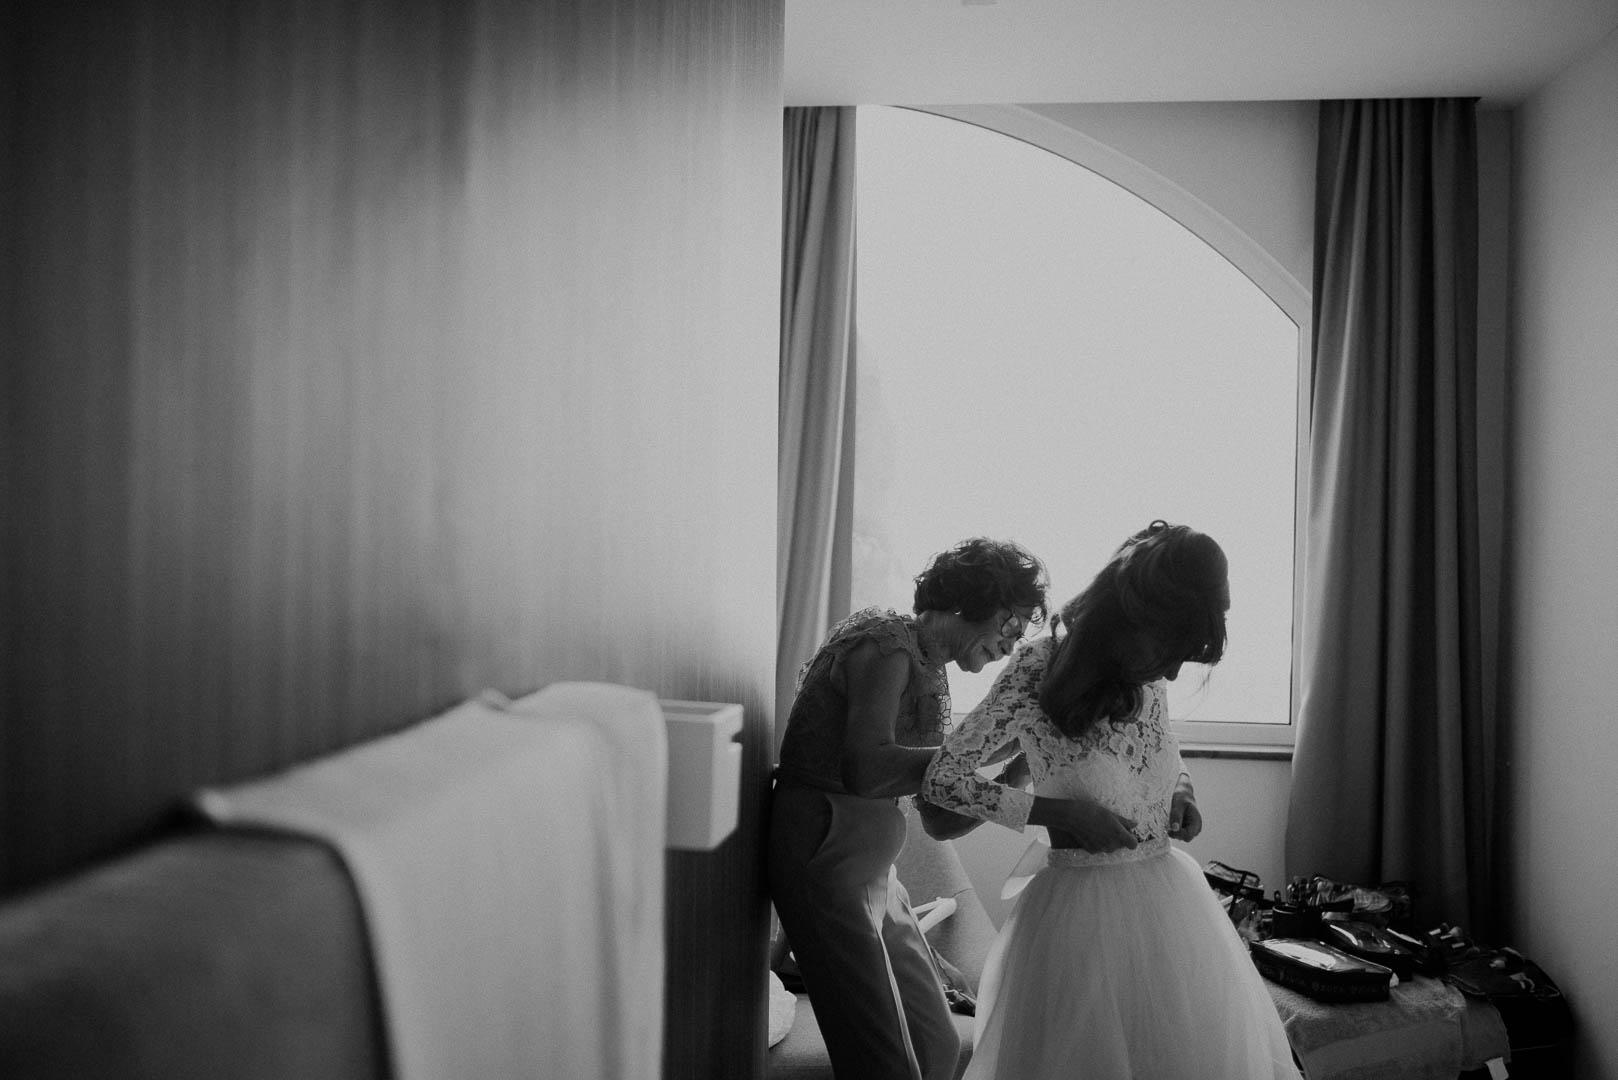 wedding-photographer-destination-fineart-bespoke-reportage-napoli-nabilah-vivianeizzo-spazio46-44